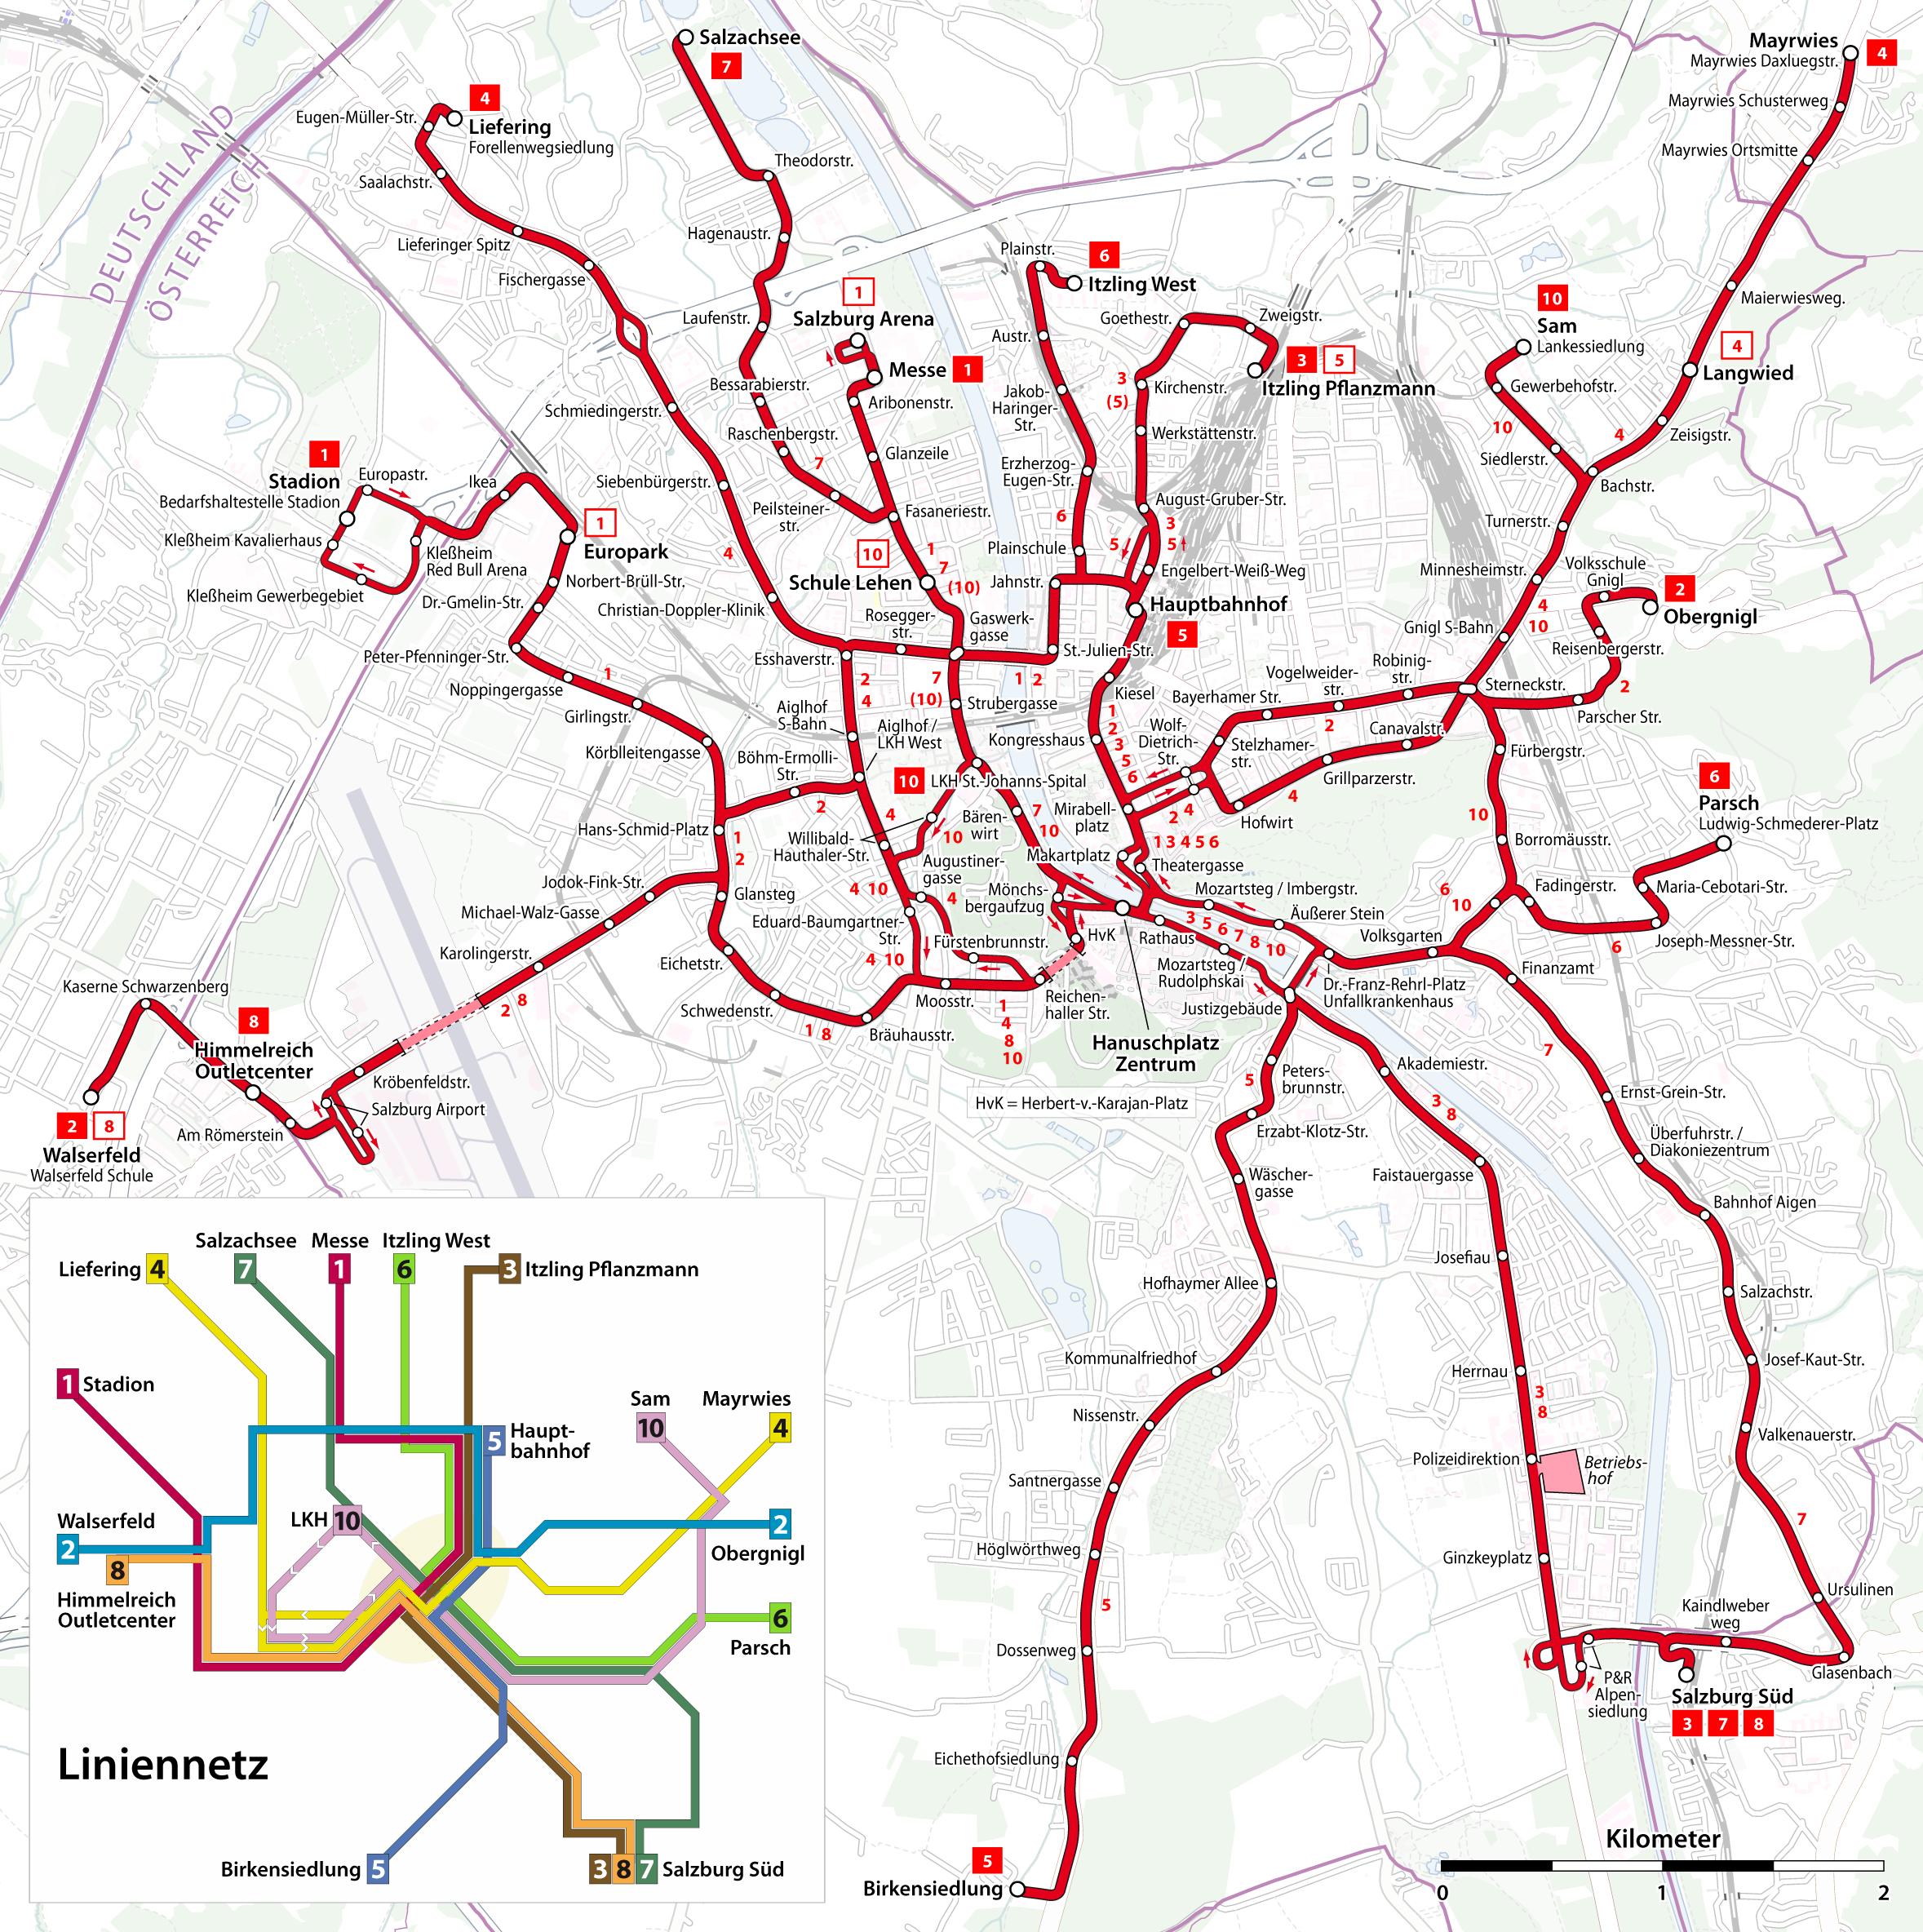 Salzburg Trolleybus Map Salzburg Pinterest